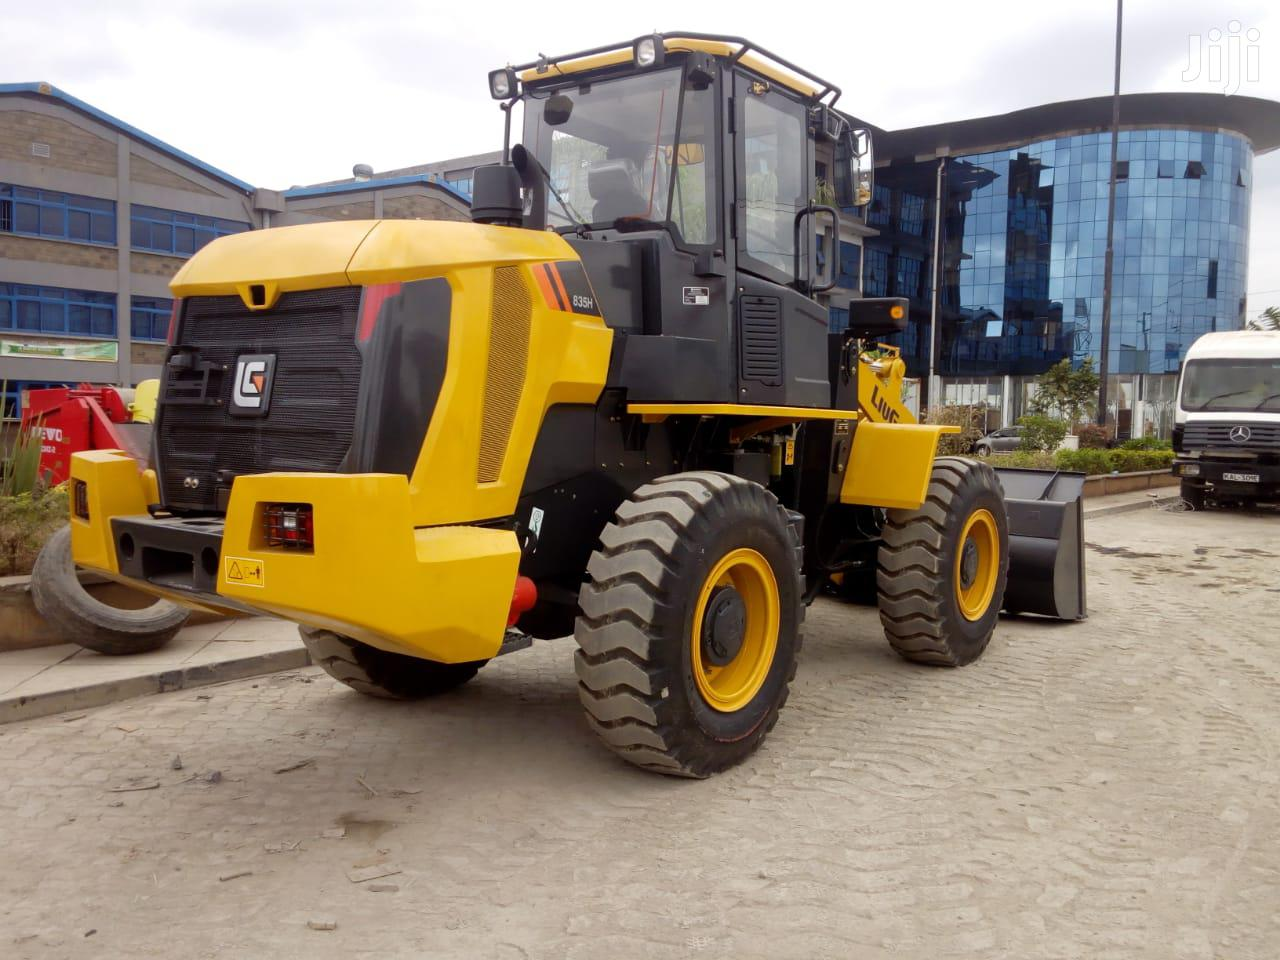 Liugong 3ton Wheel Loader 2020 Yellow for Sale   Heavy Equipment for sale in Imara Daima, Nairobi, Kenya